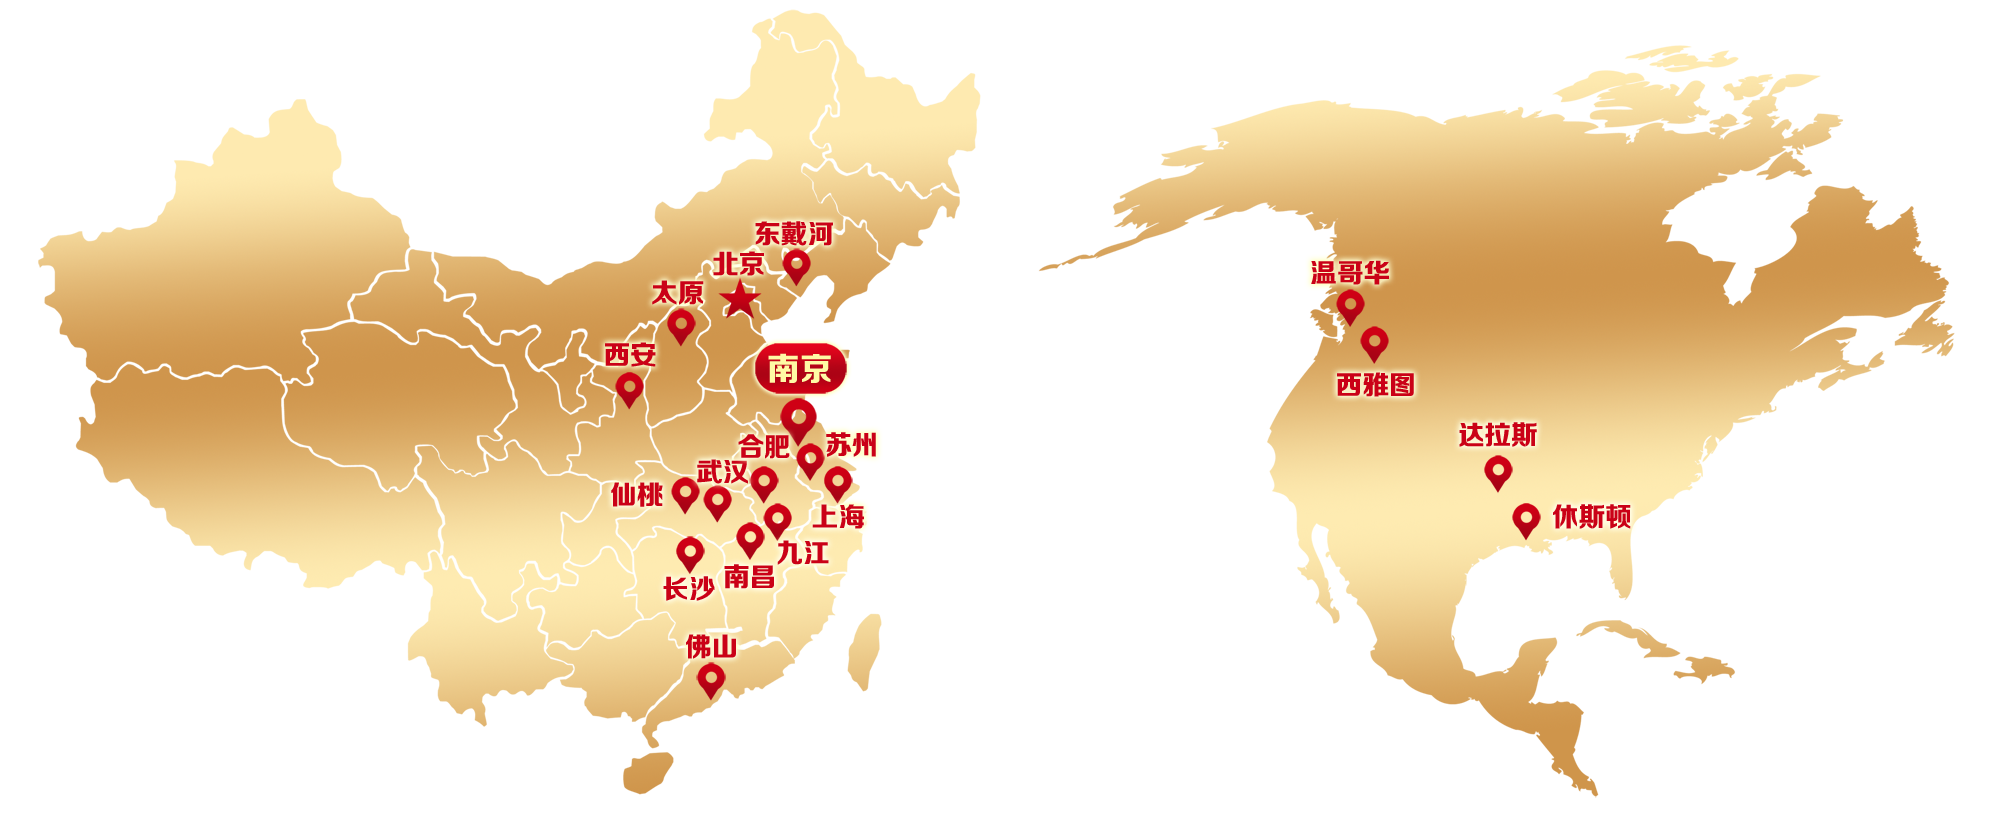 项目分布图.png